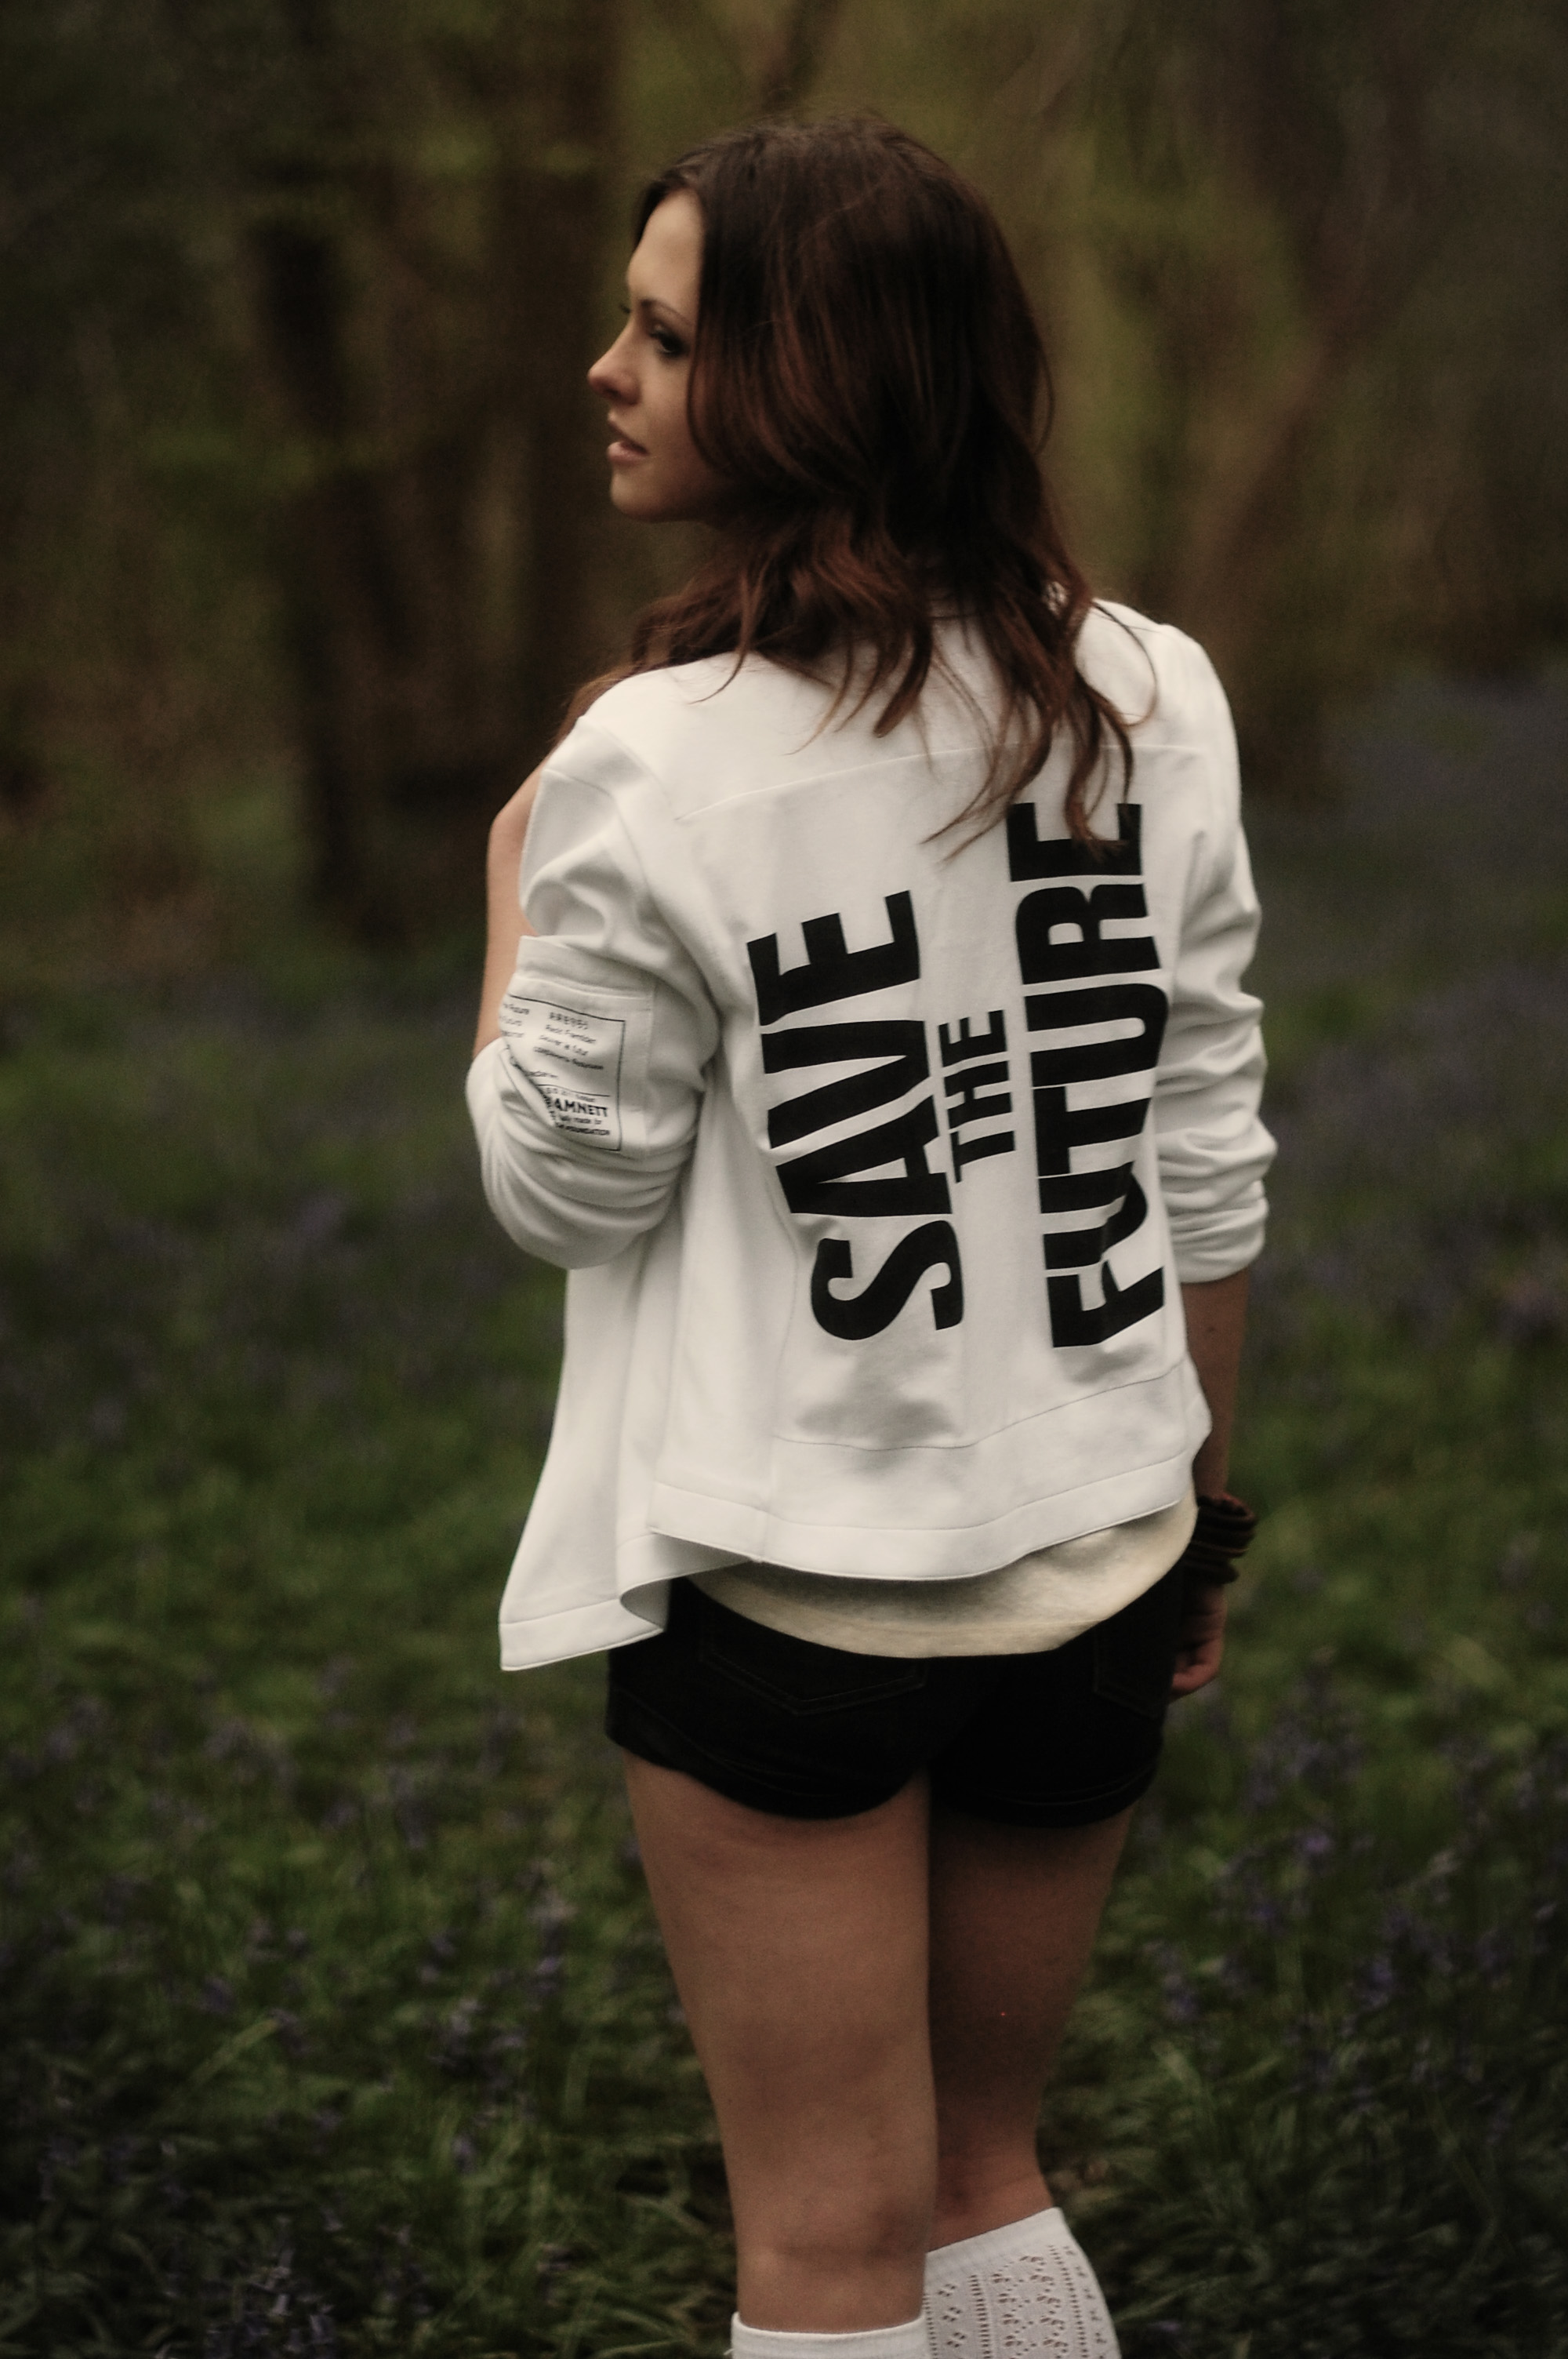 SaveTheFuture3